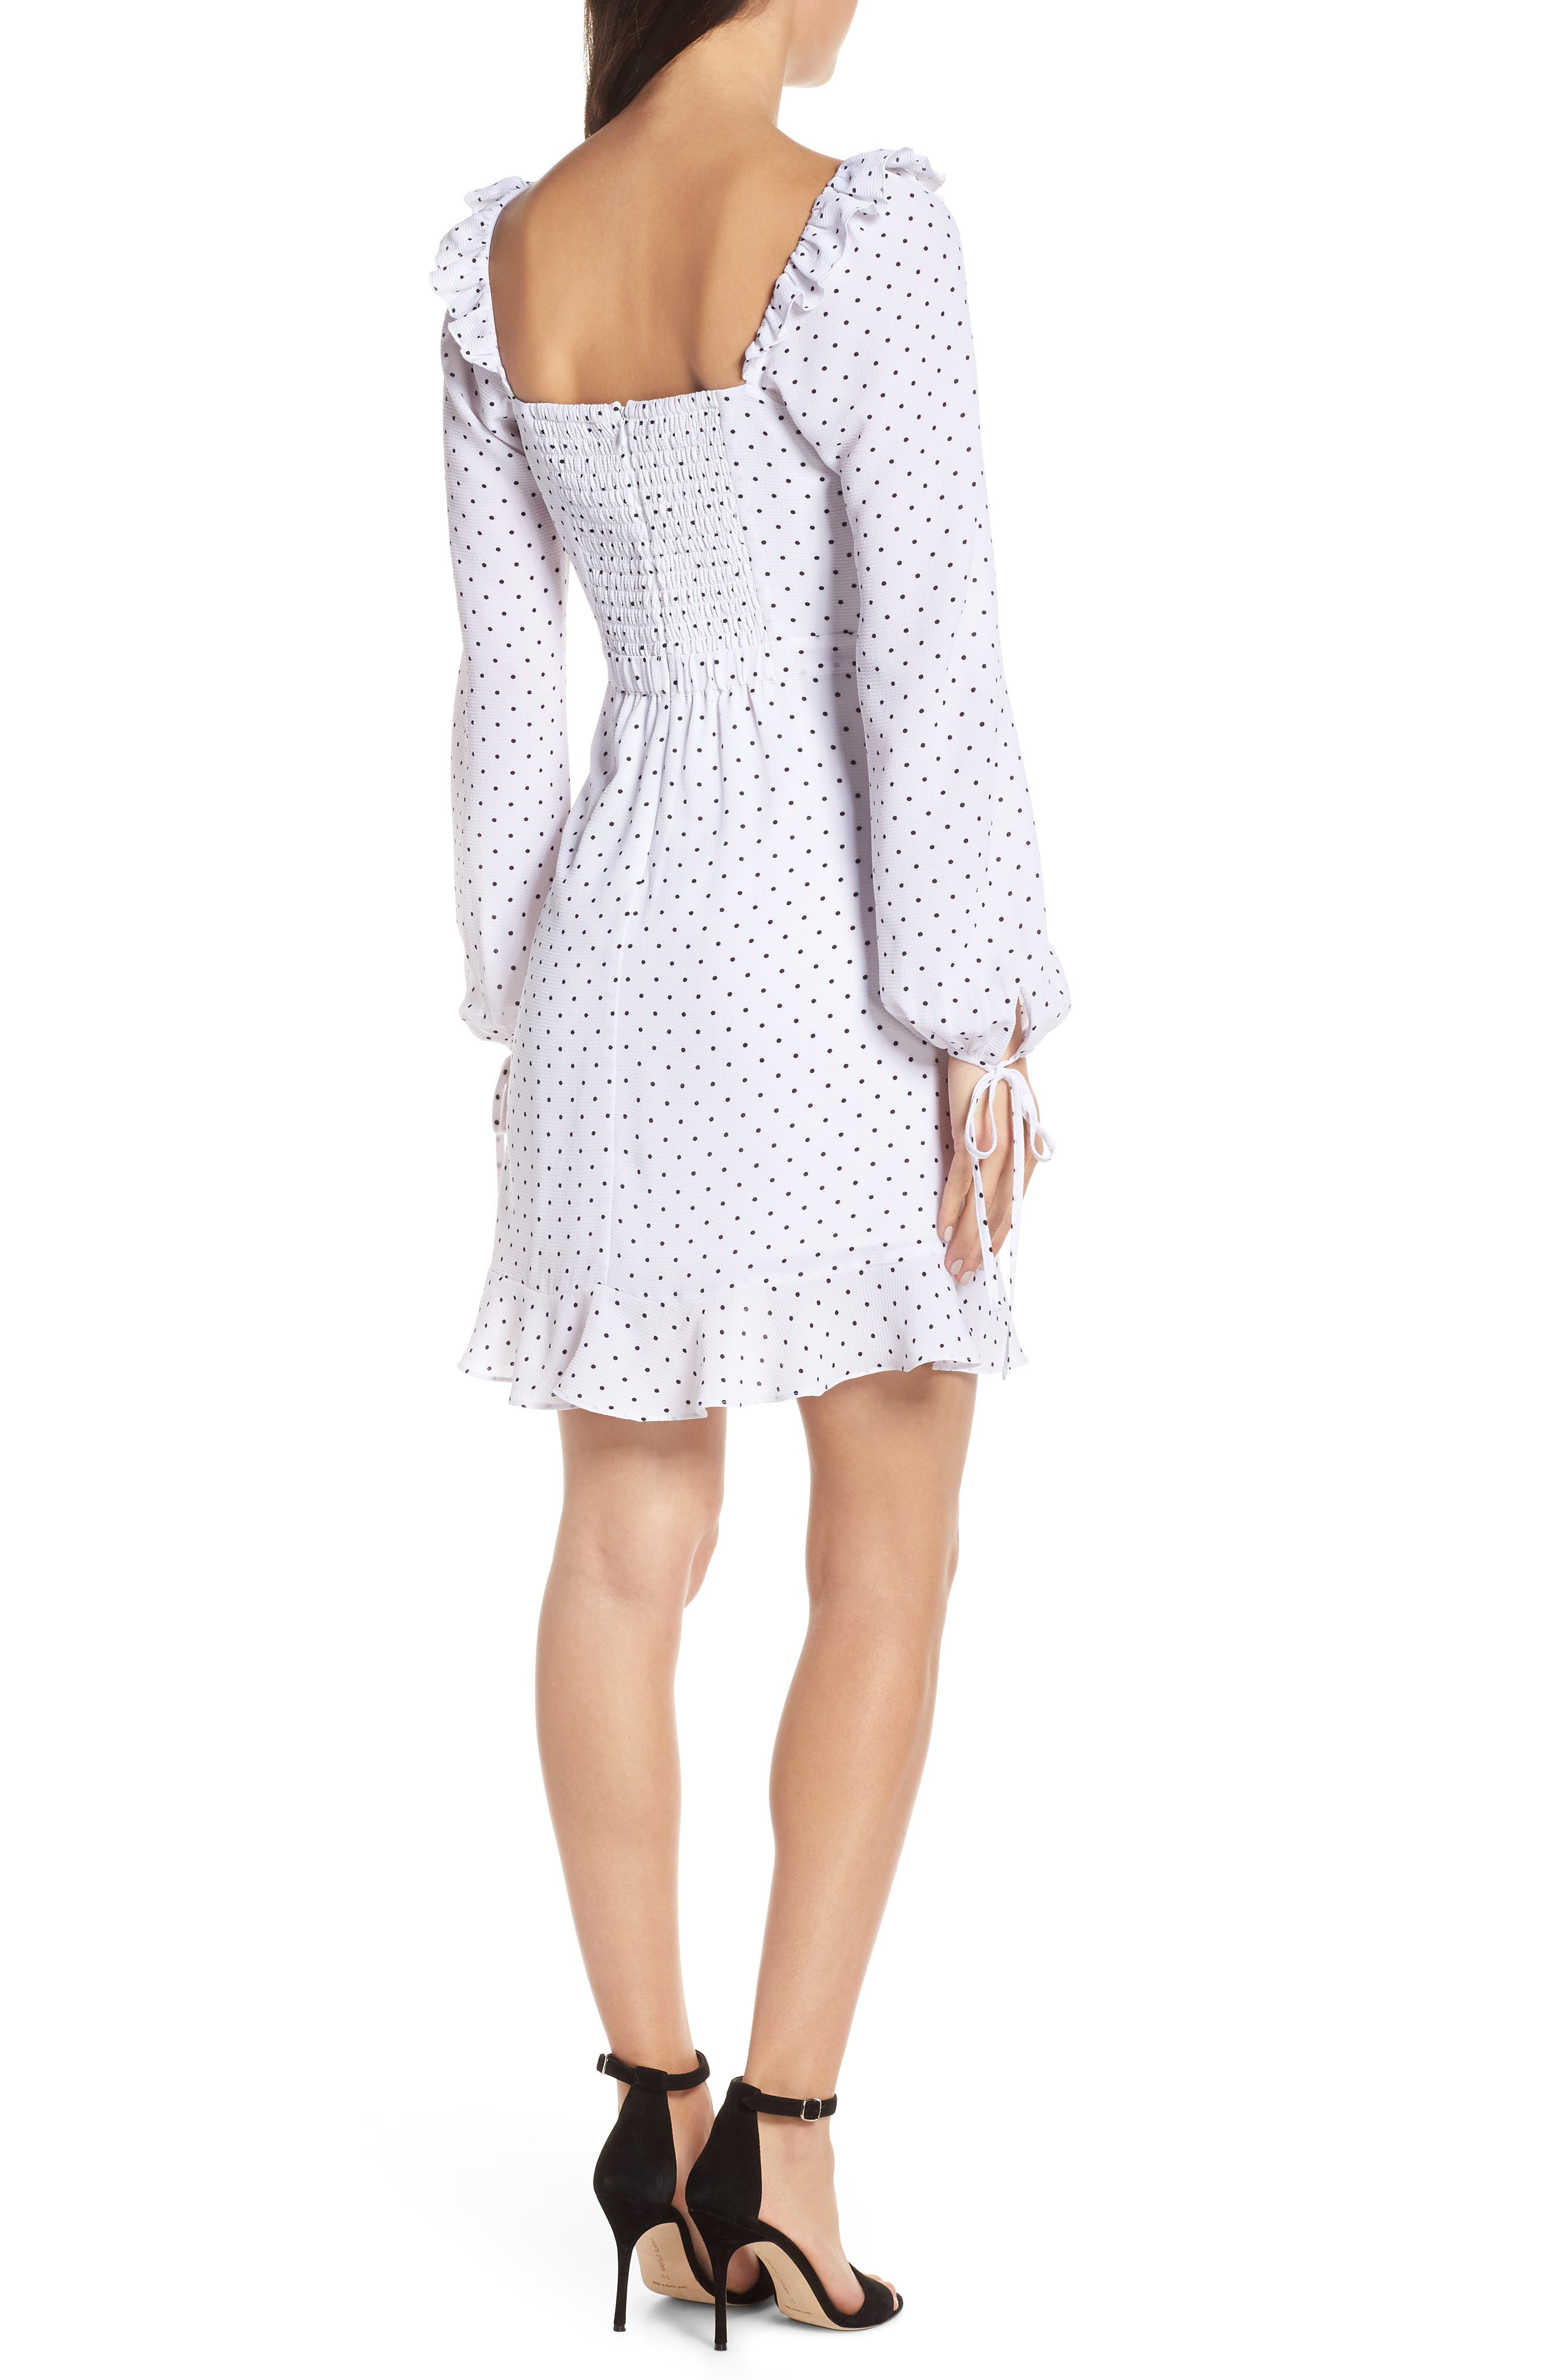 ALI & JAY, In Bloom Polka Dot Asymmetrical Dress, Alternate thumbnail 2, color, 100